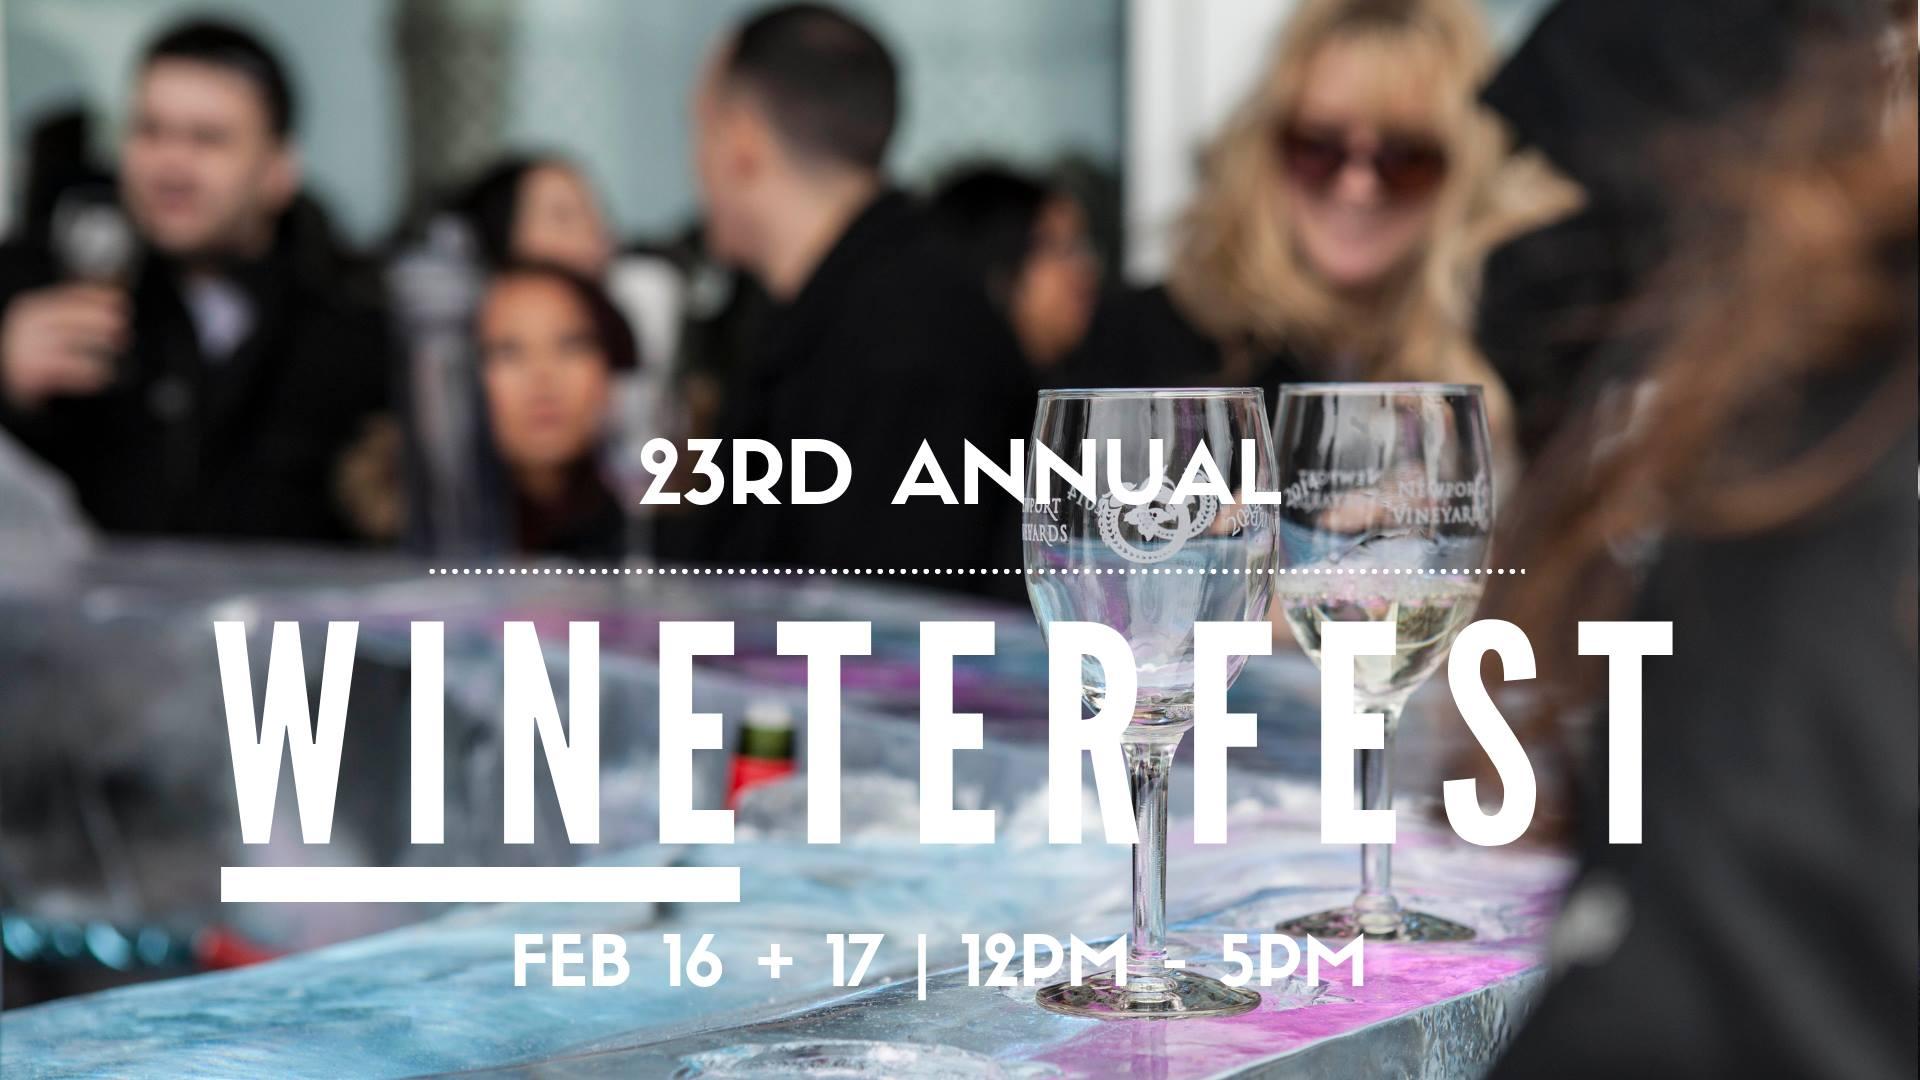 February 16 – 17, 2019: Newport Vineyards' WINEterfest Weekend